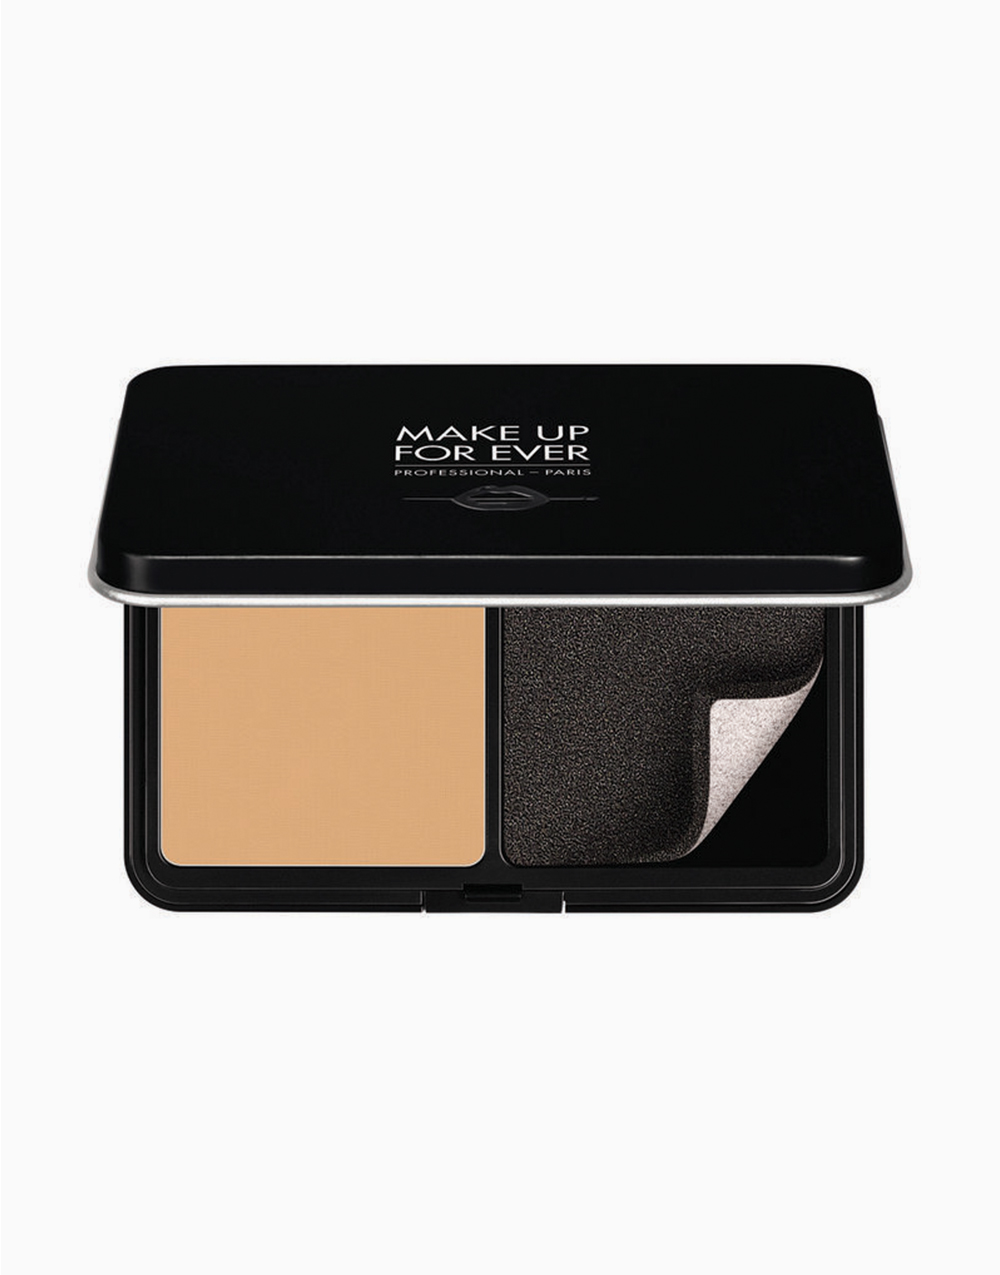 Matte Velvet Skin Compact (11g) by Make Up For Ever | Y355